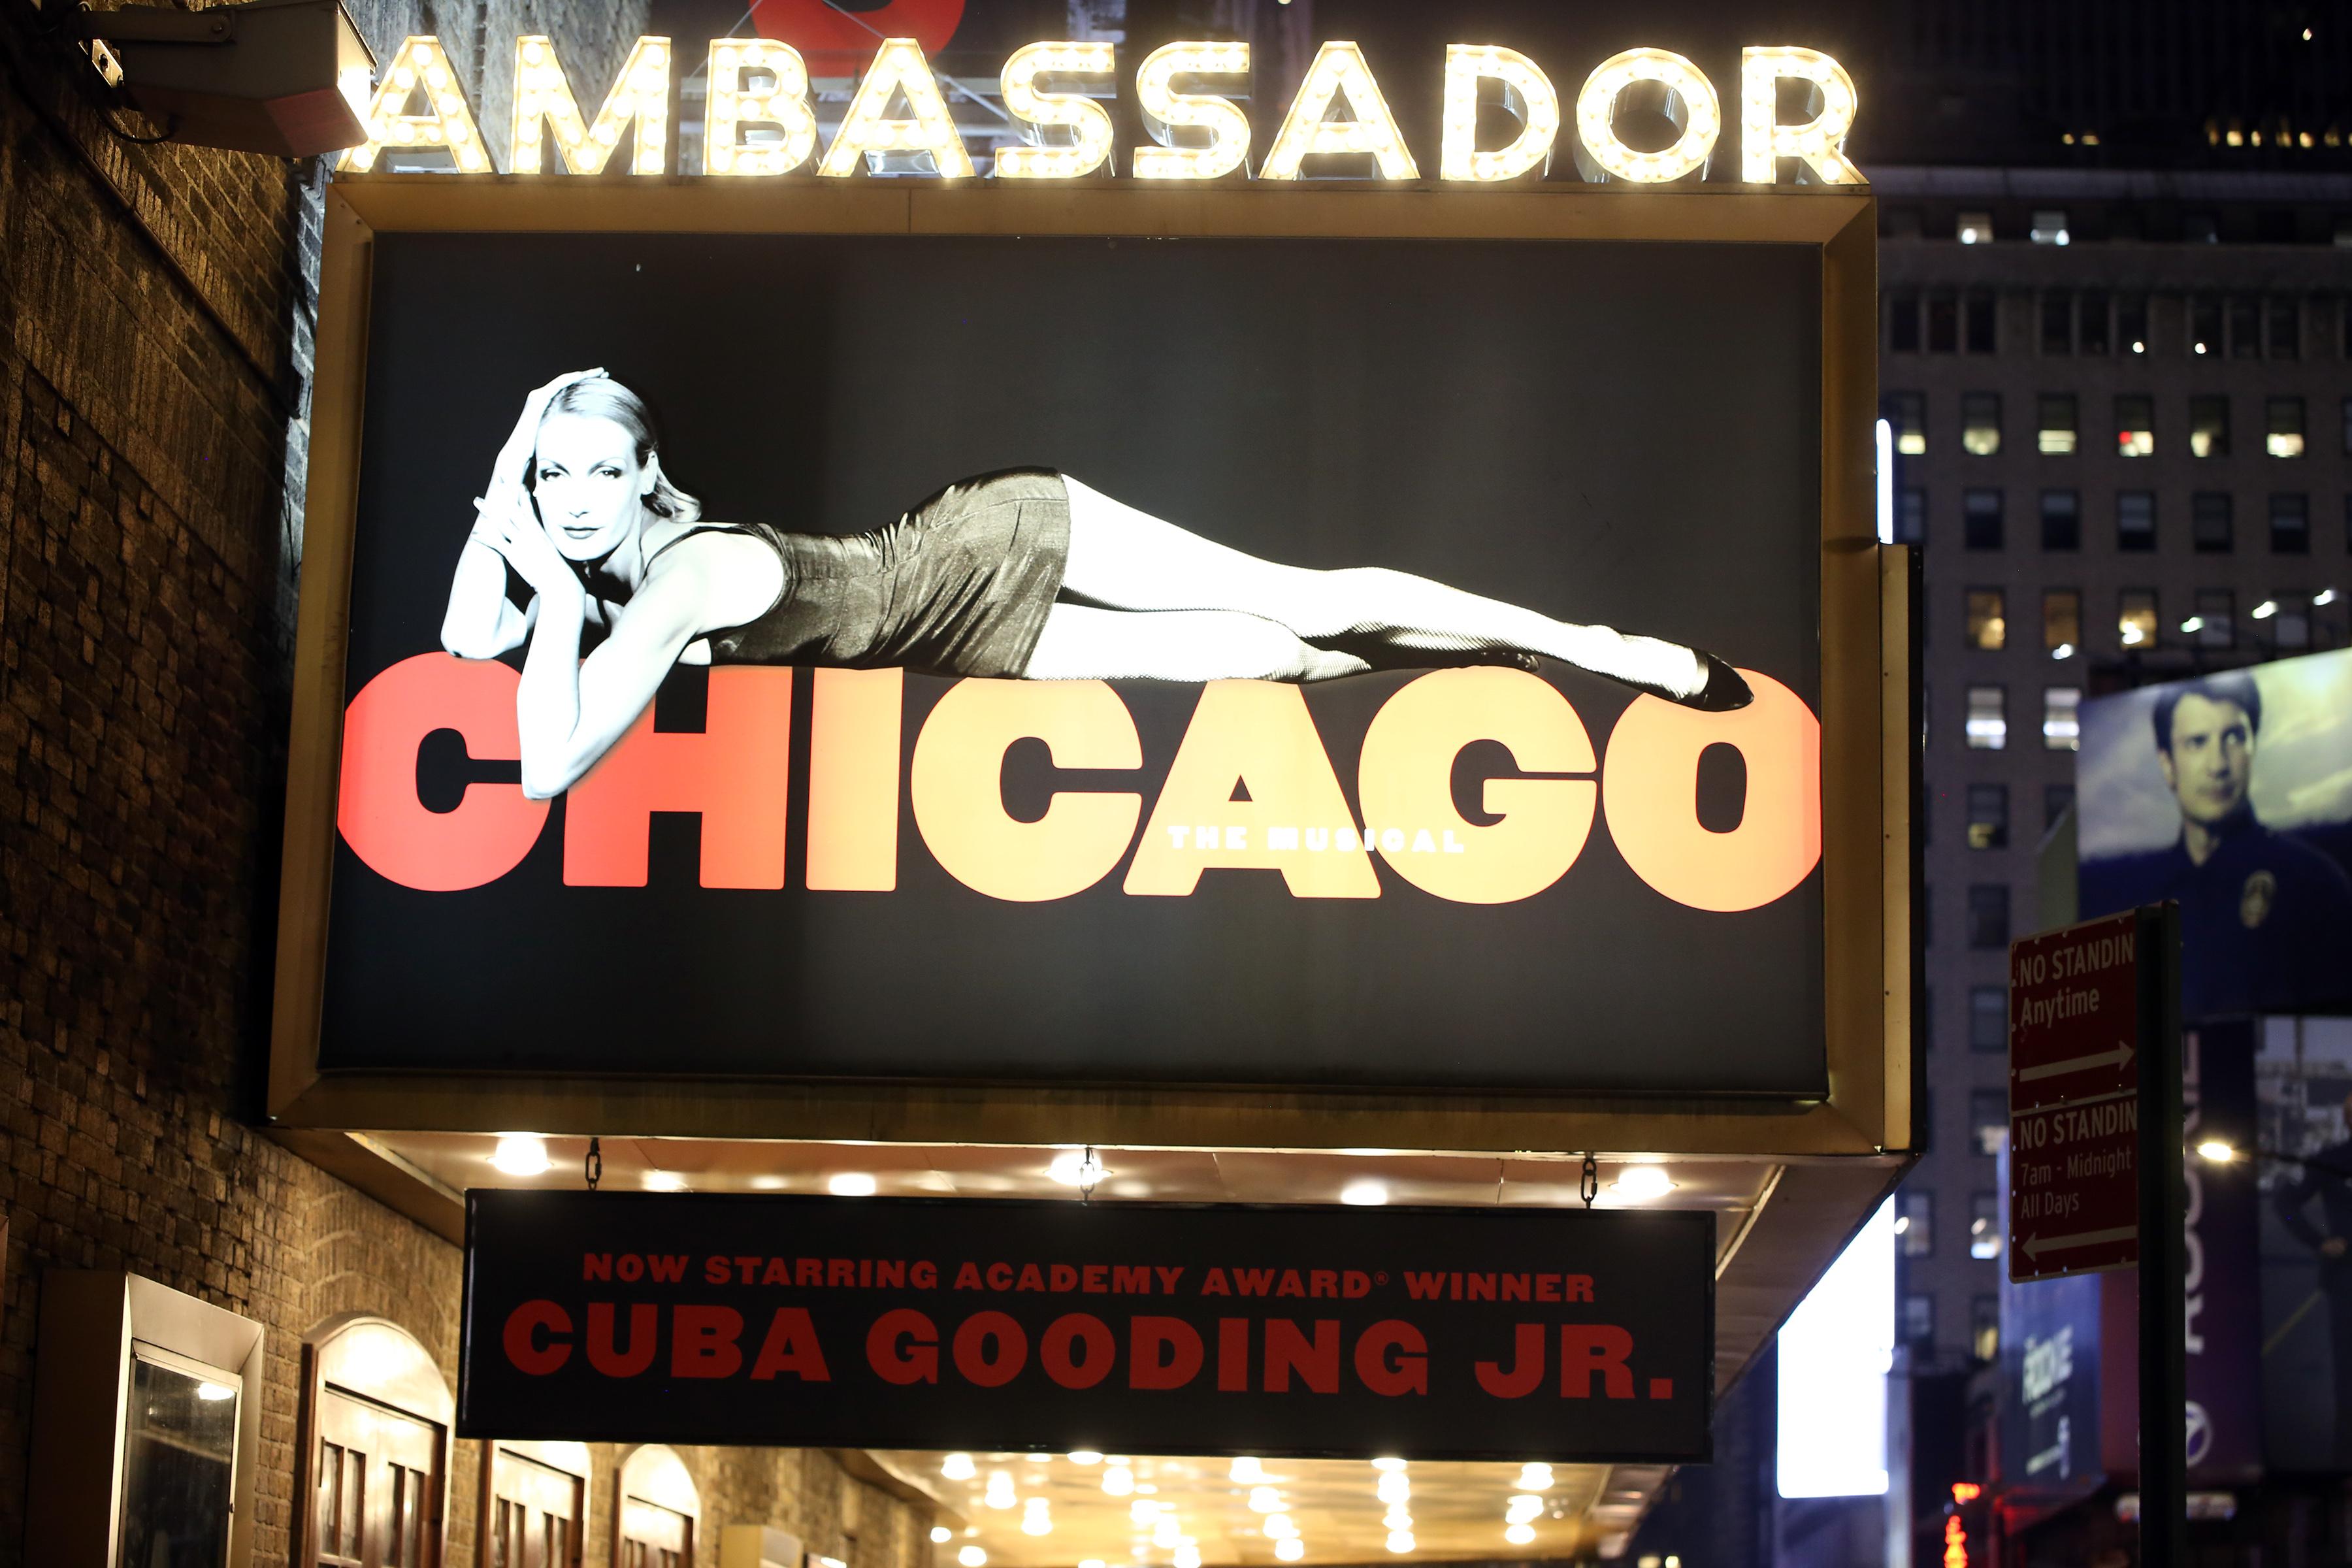 Ambassador Theatre (Broadway) - Theater Information Marquee